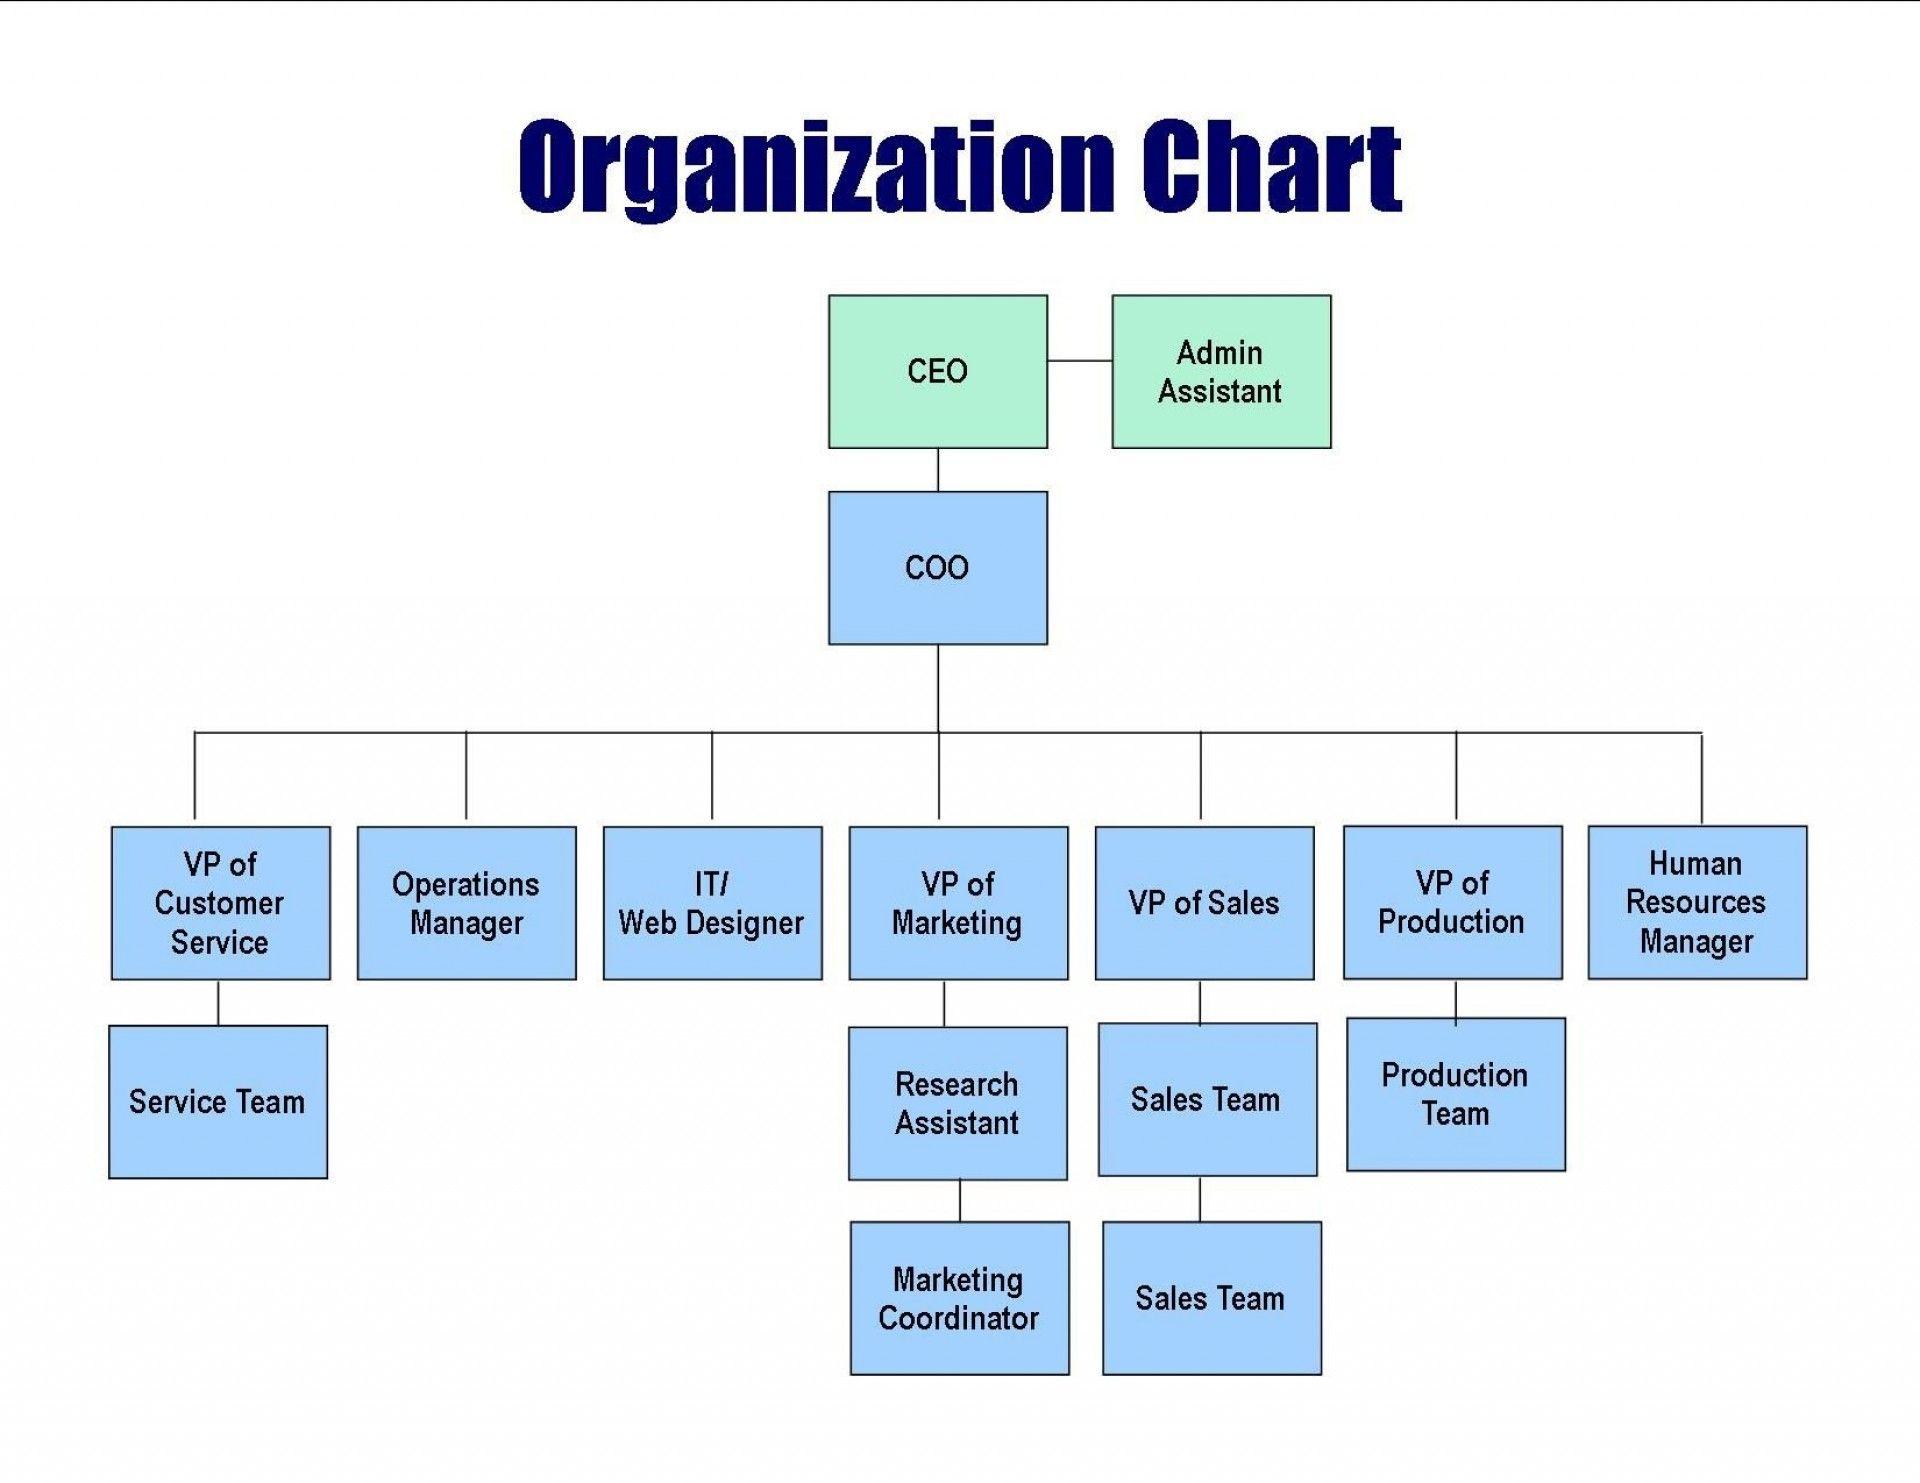 Microsoft Organization Chart Template Sample Idea Jpg Regarding Organization Chart Template Word Best Templ In 2020 Organizational Chart Business Org Chart Org Chart